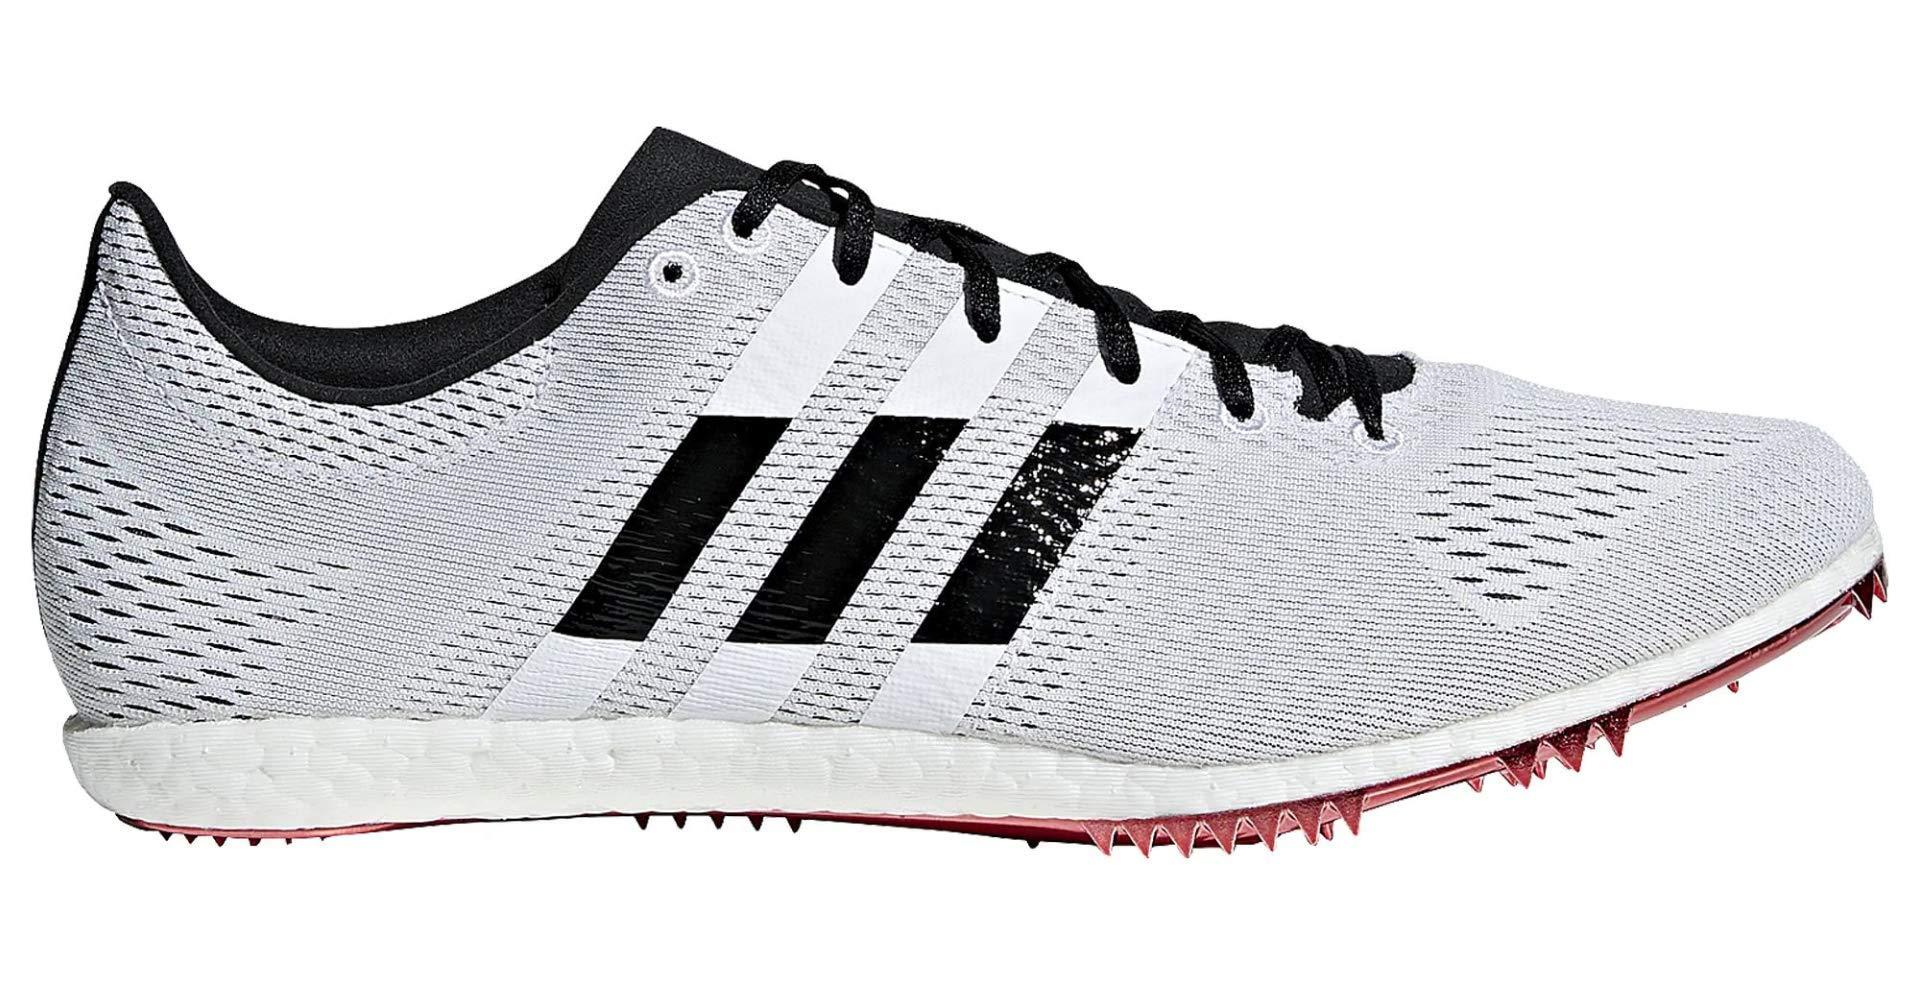 adidas Adizero Avanti Spike Shoe - Unisex Track & Field White/Core Black/Shock Red by adidas